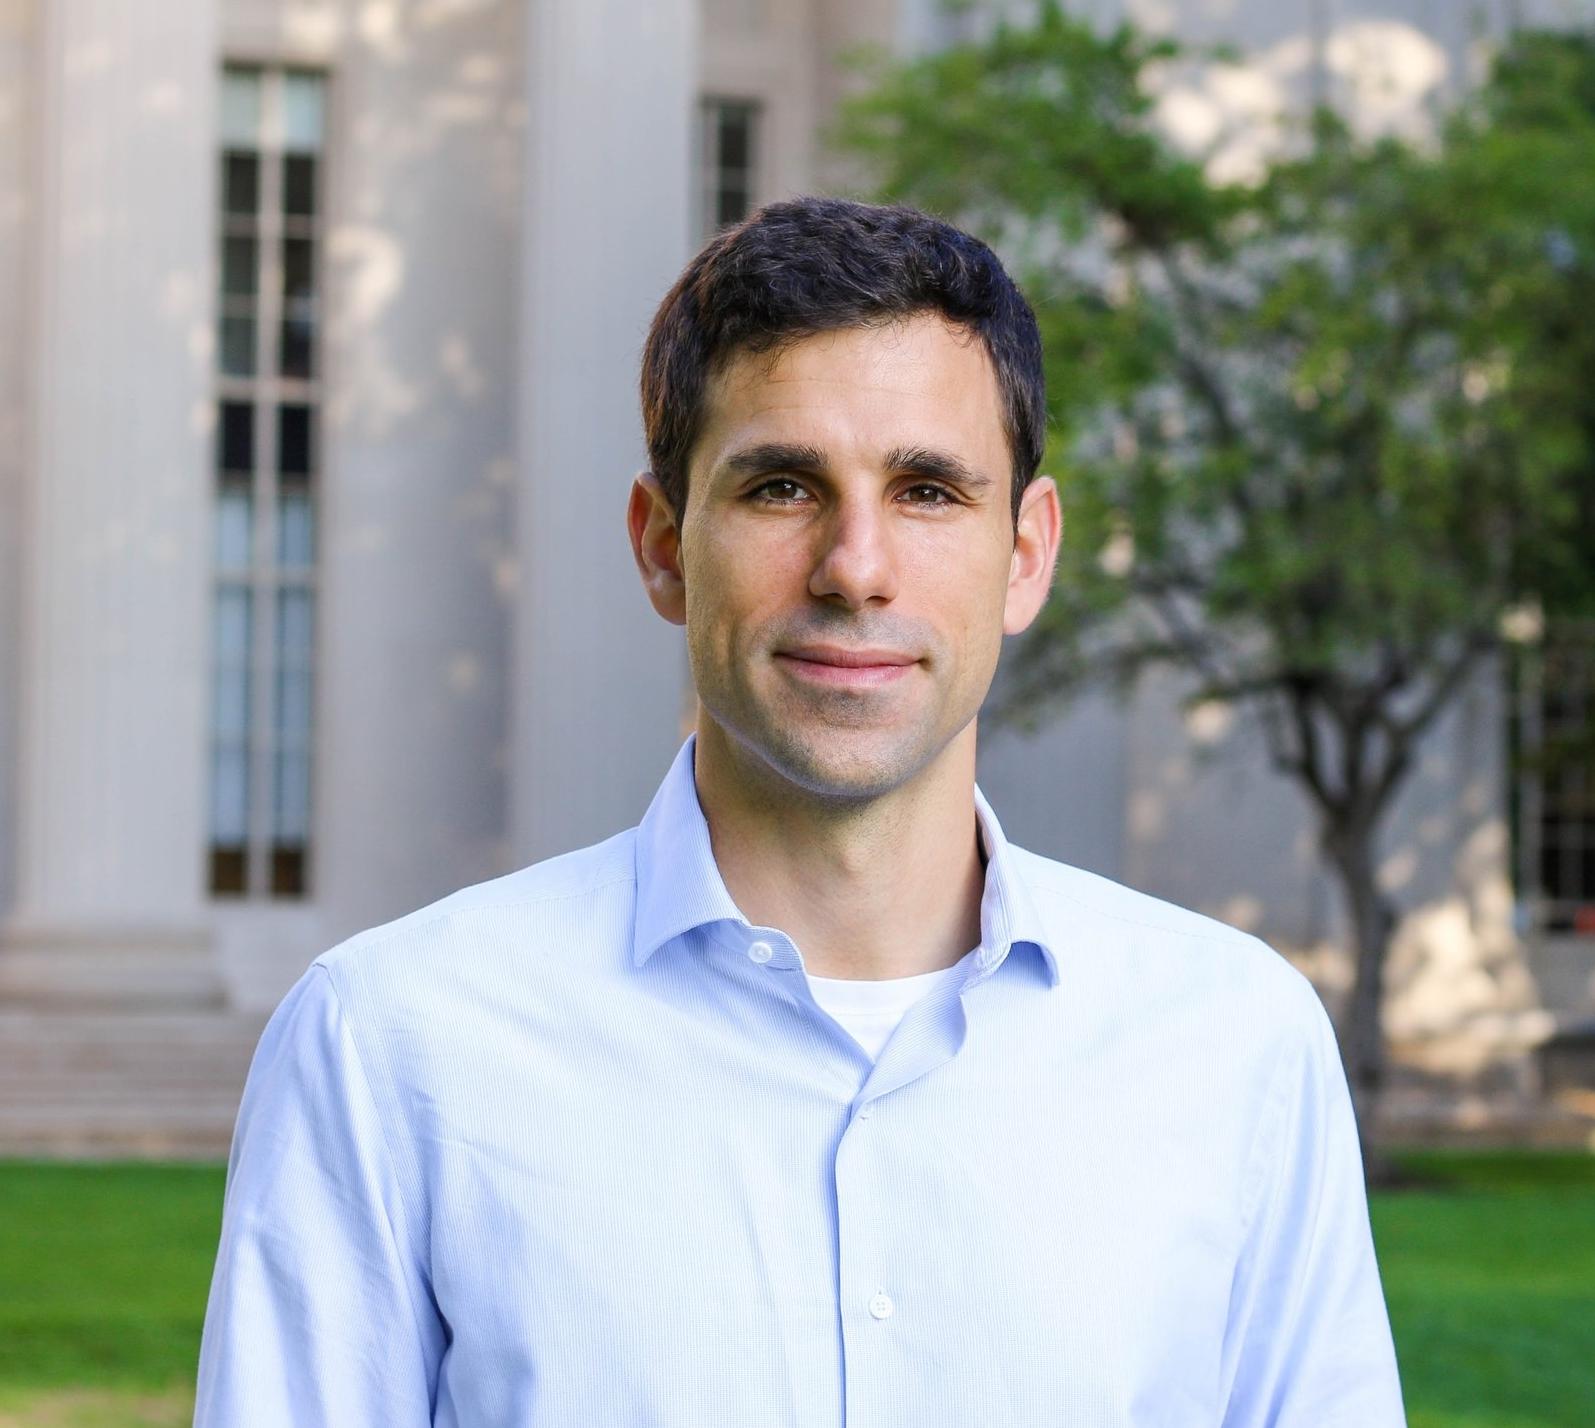 Dr. César de la Fuente Nunez, a Postdoctoral Associate and Ramon Areces Foundation Fellow at MIT, working with Prof. Timothy K. Lu.